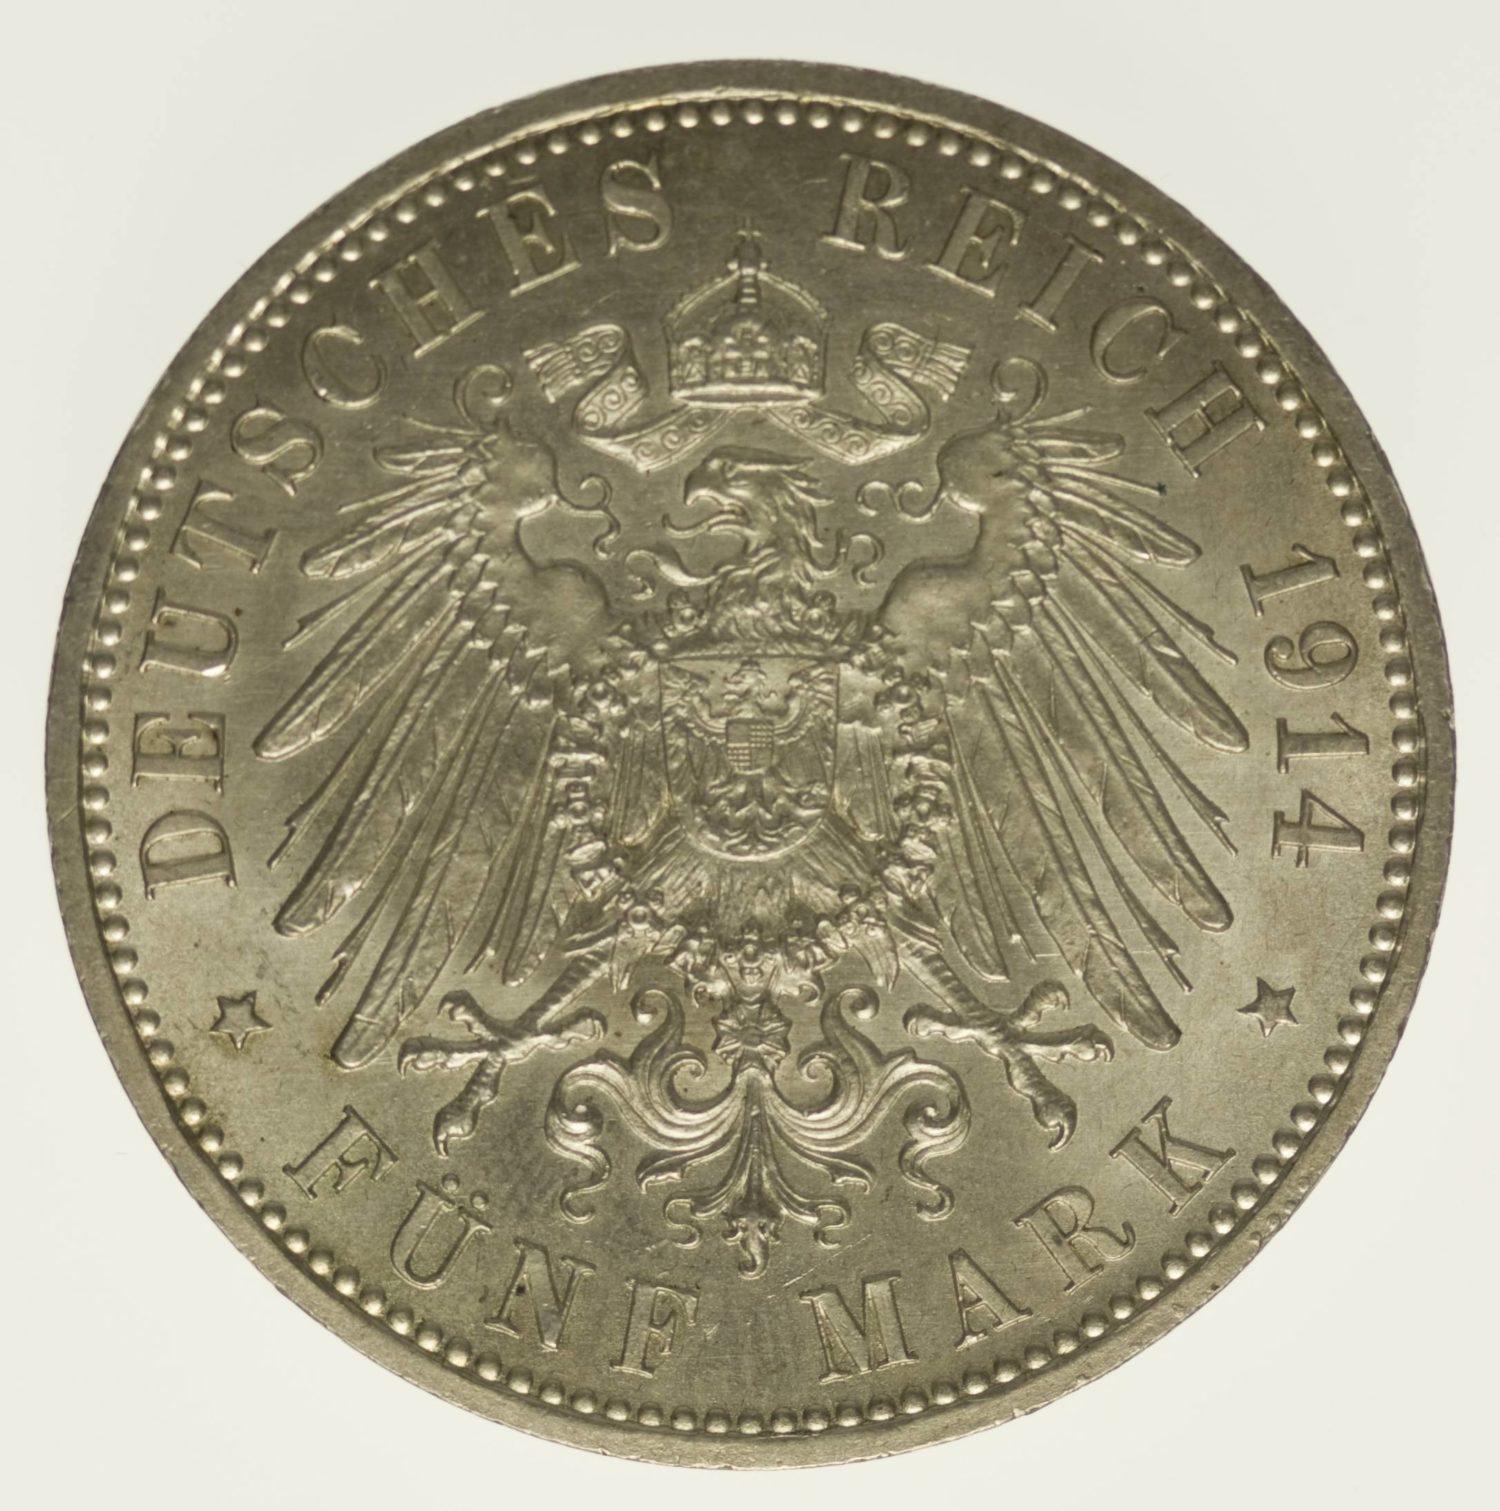 Anhalt Friedrich II. Silberhochzeit 5 Mark 1914 Silber 25 Gramm fein RAR